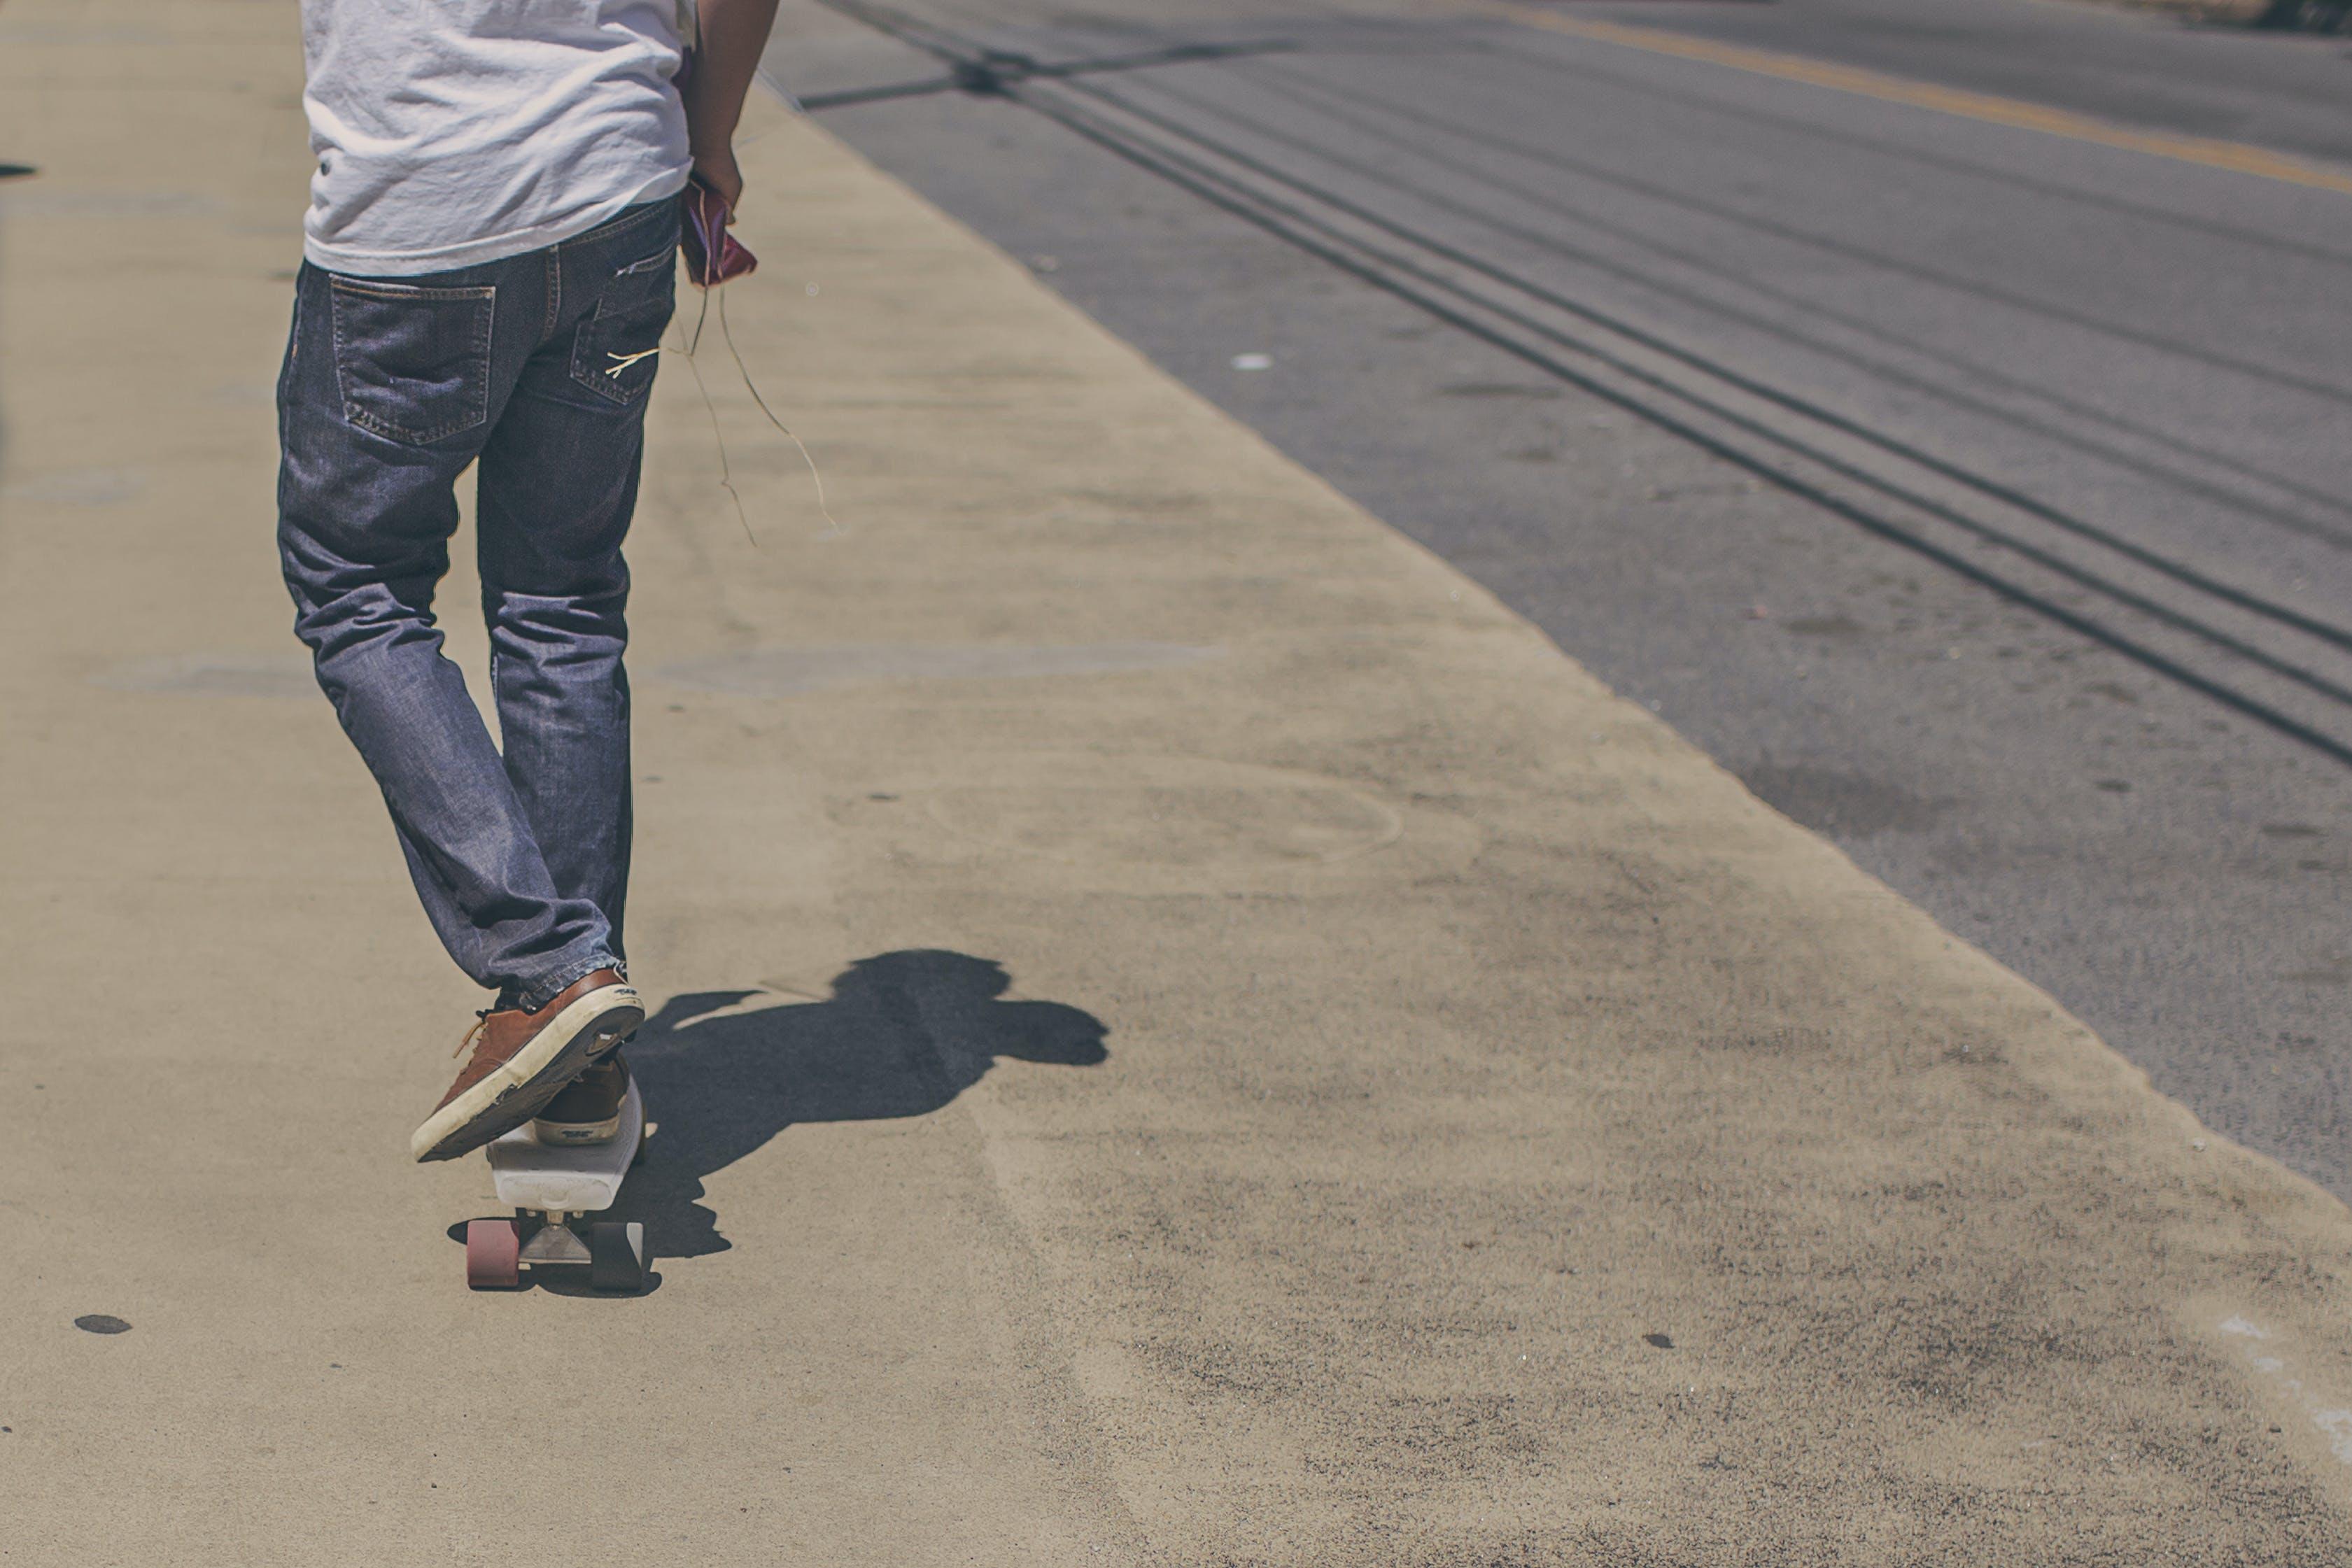 Man Riding Skateboard on Road